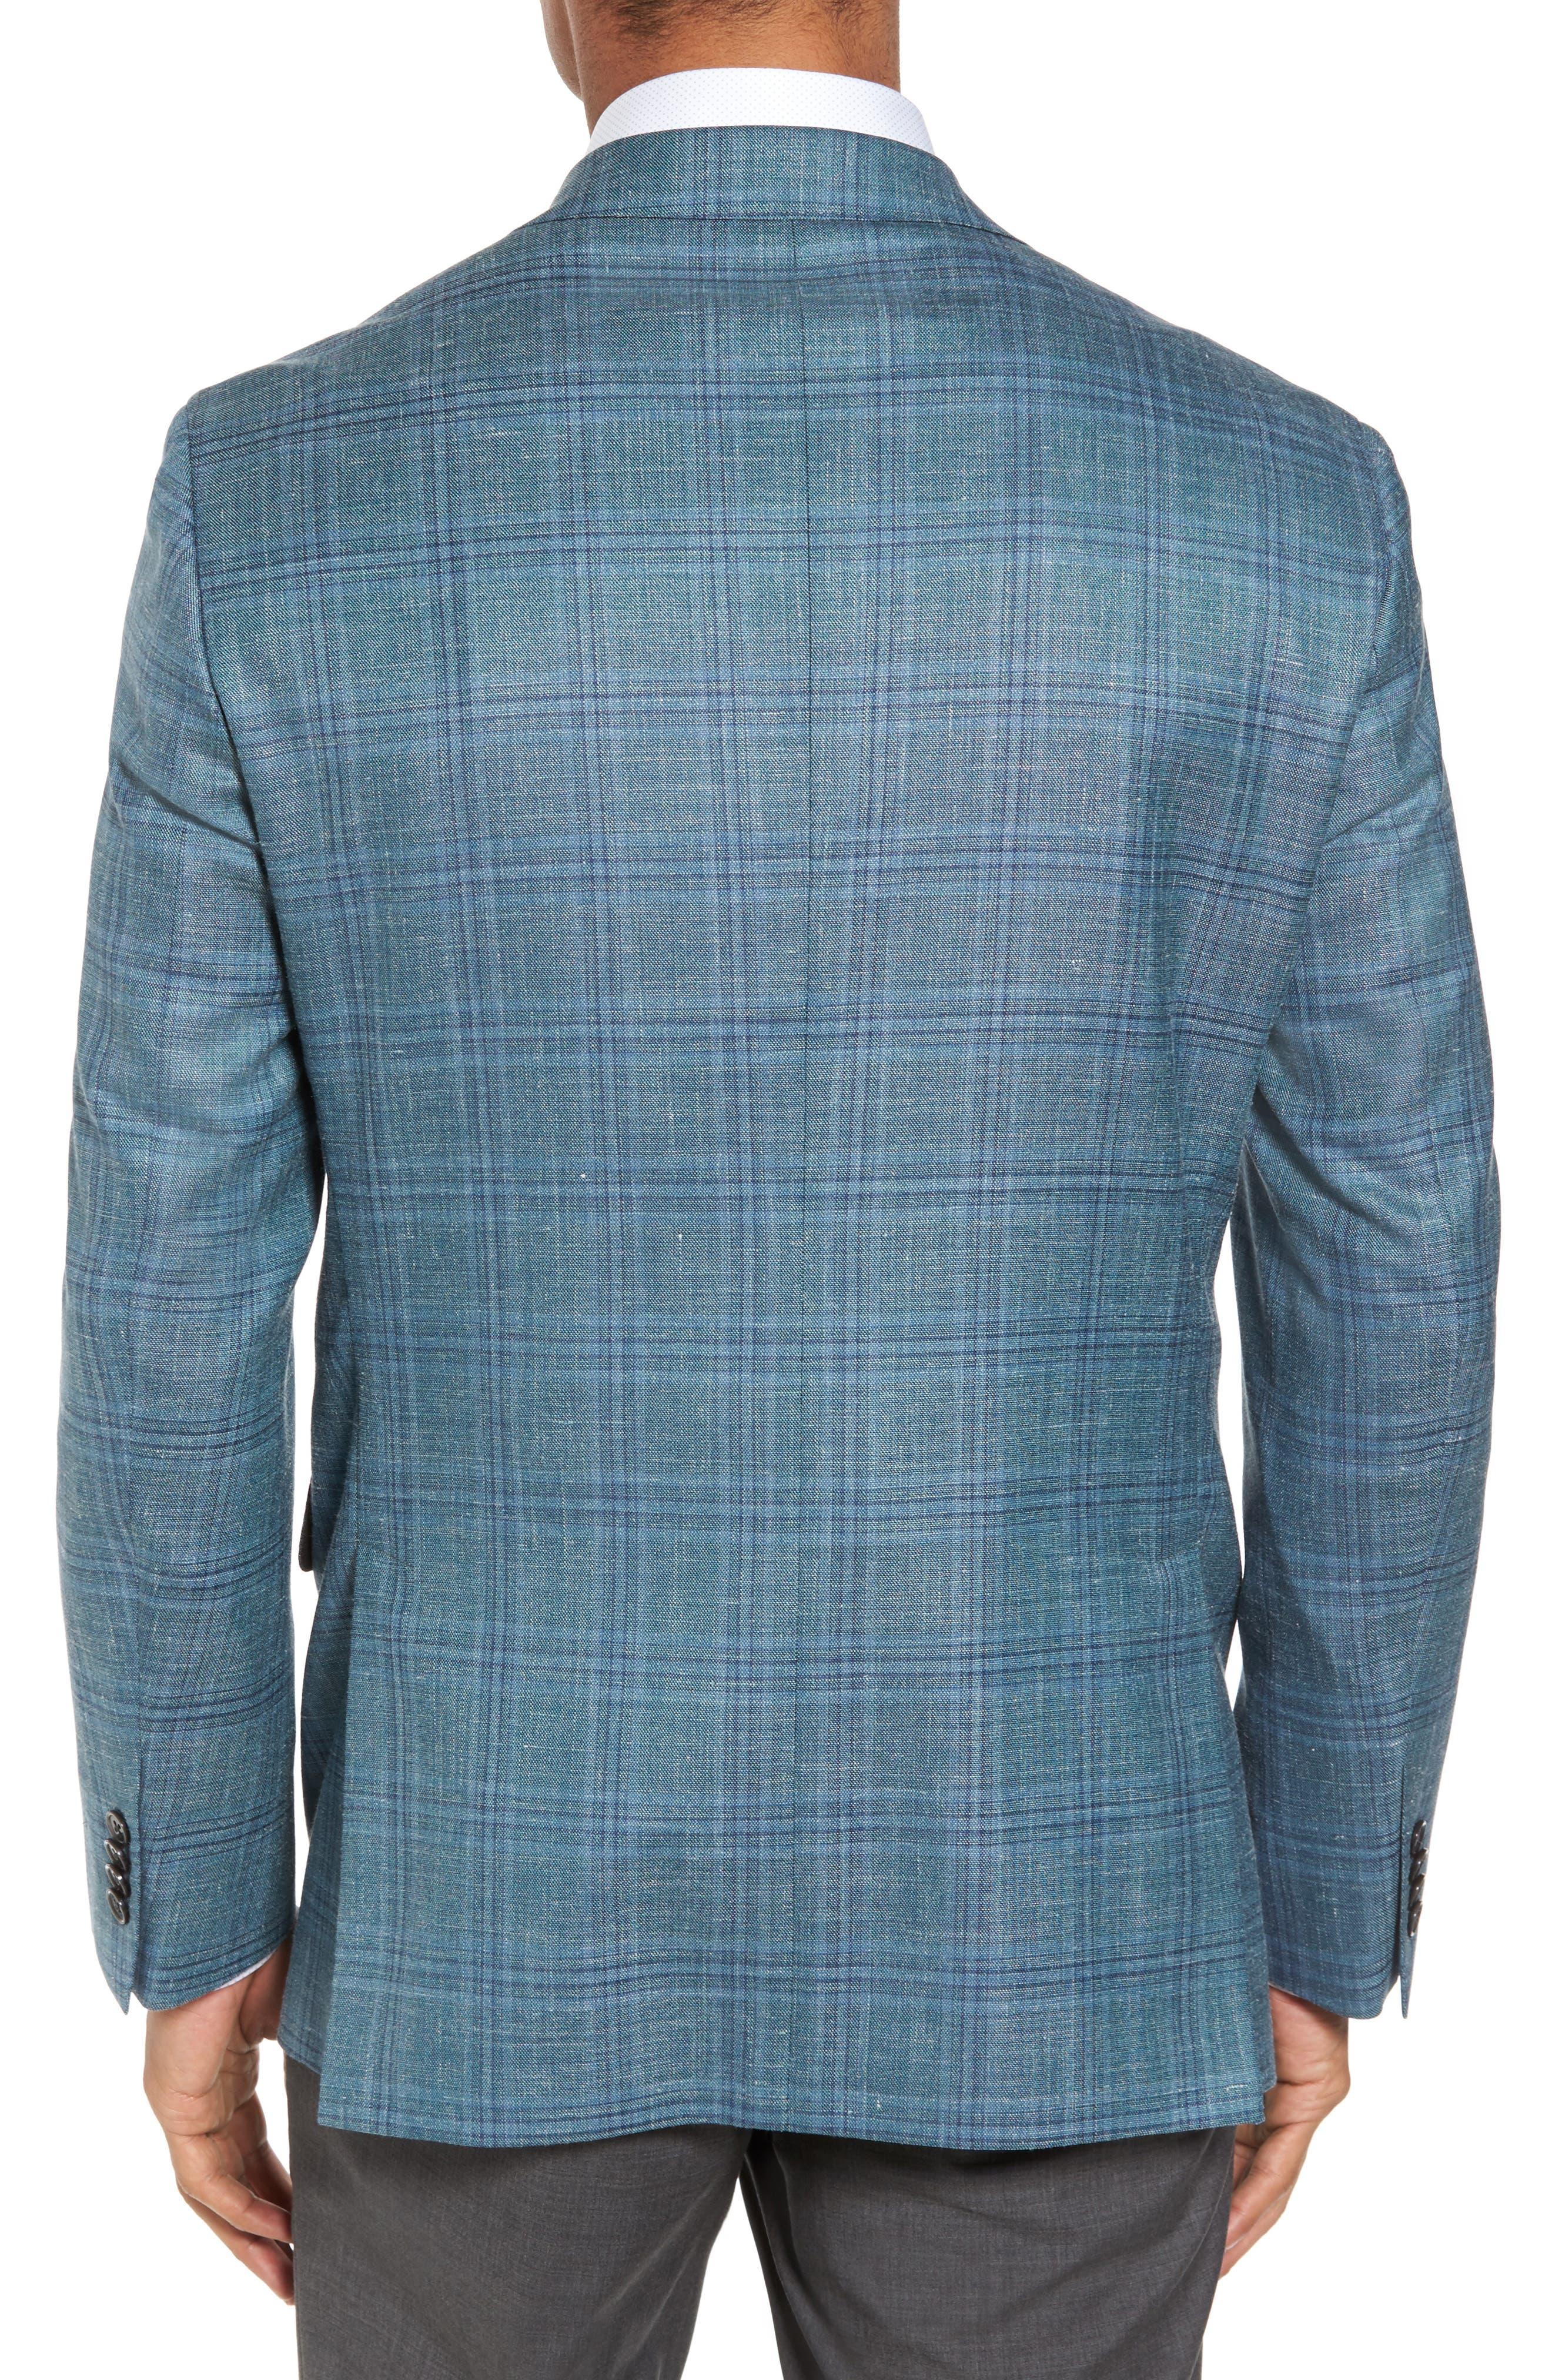 Alternate Image 2  - David Donahue Ashton Classic Fit Stretch Plaid Wool Blend Sport Coat